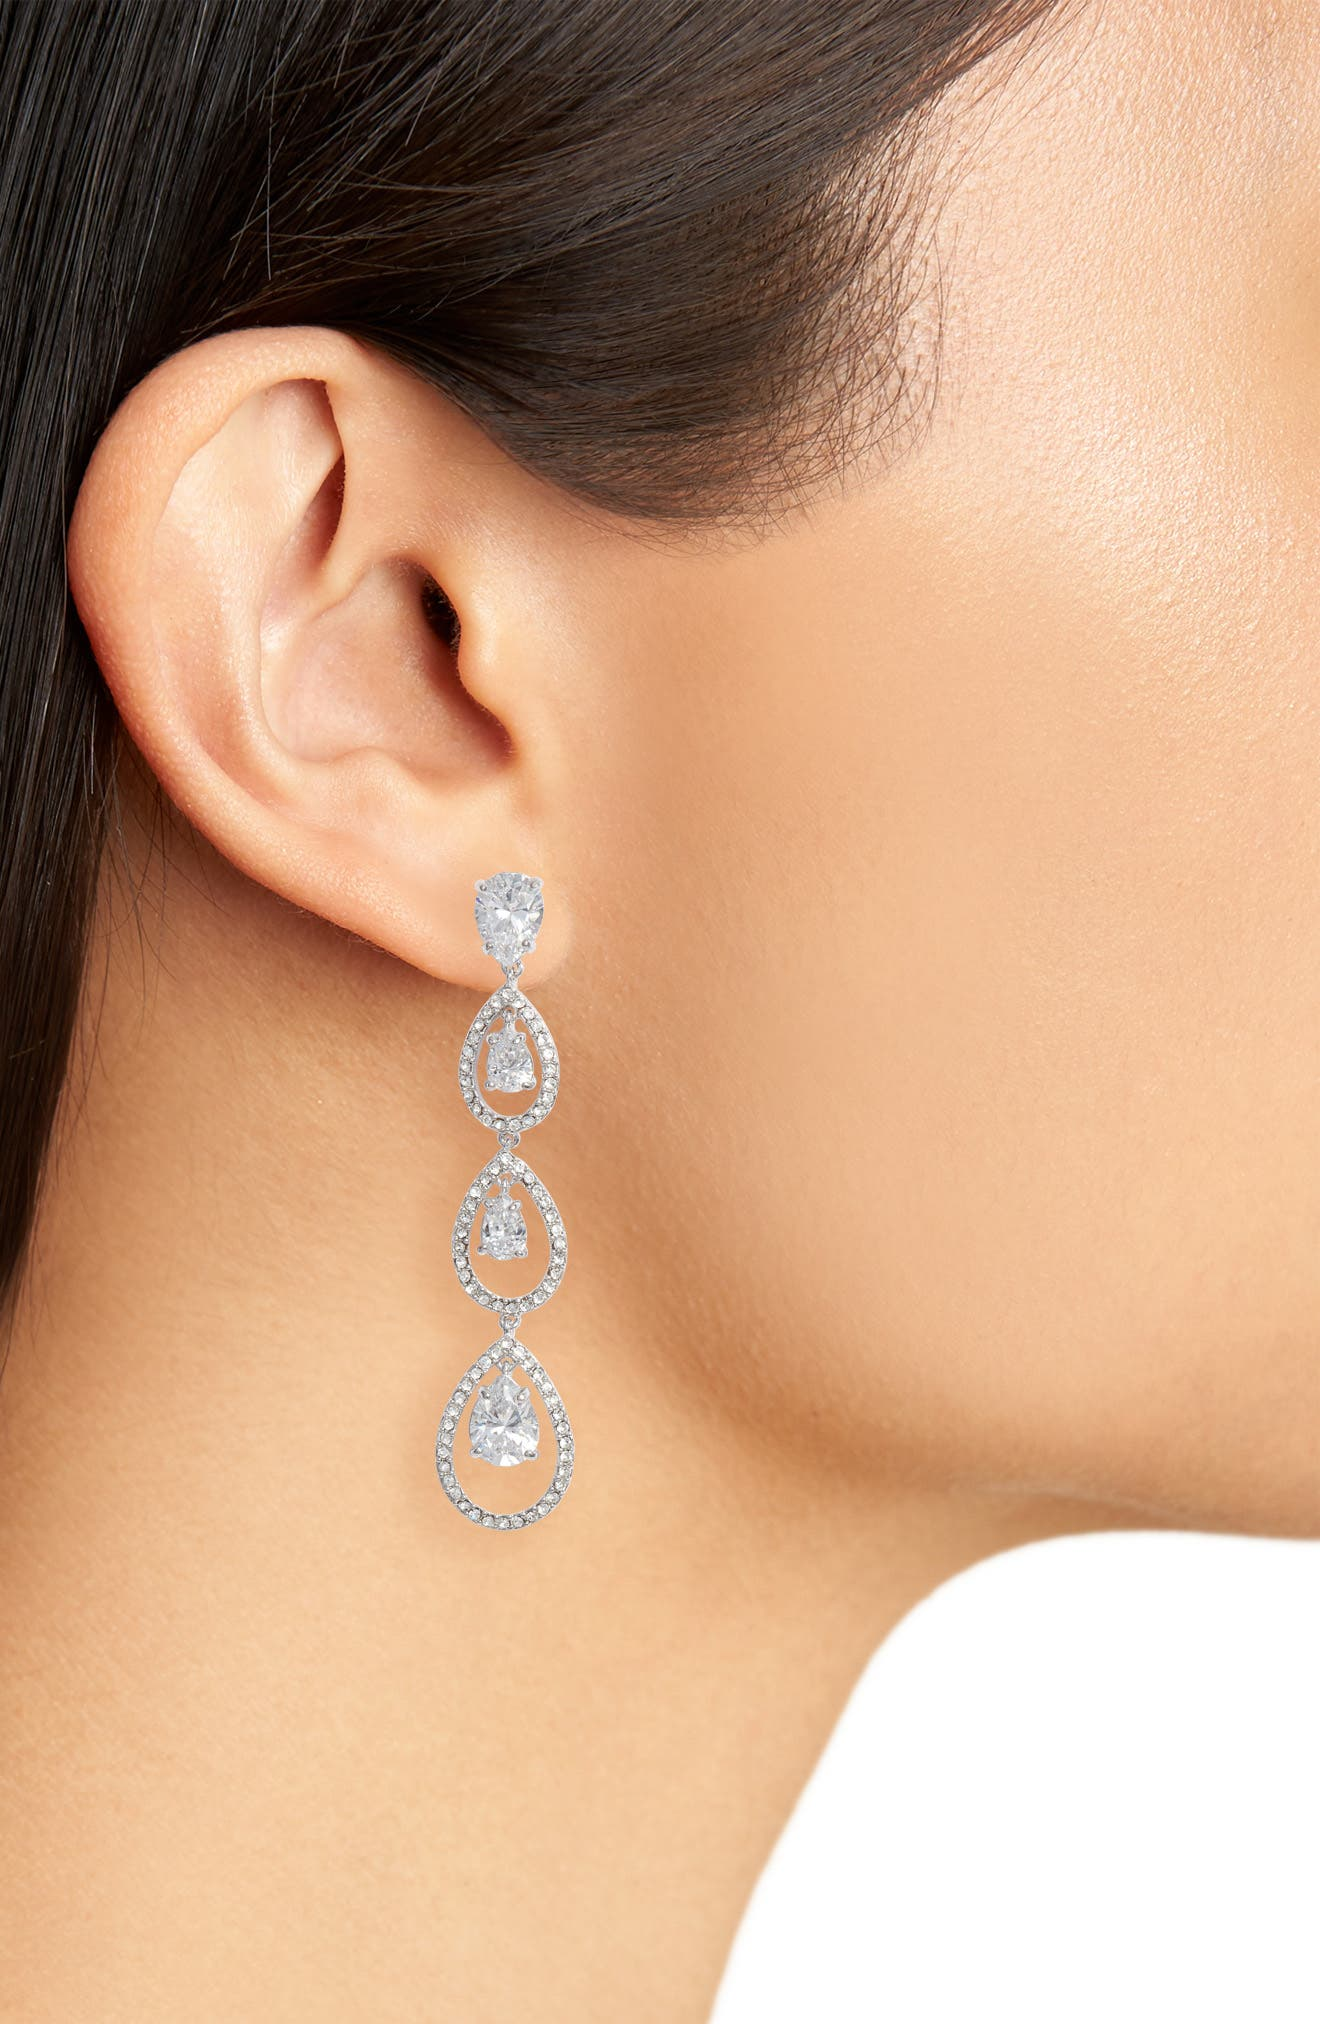 Cubic Zirconia Linear Drop Earrings,                             Alternate thumbnail 2, color,                             CLEAR- SILVER